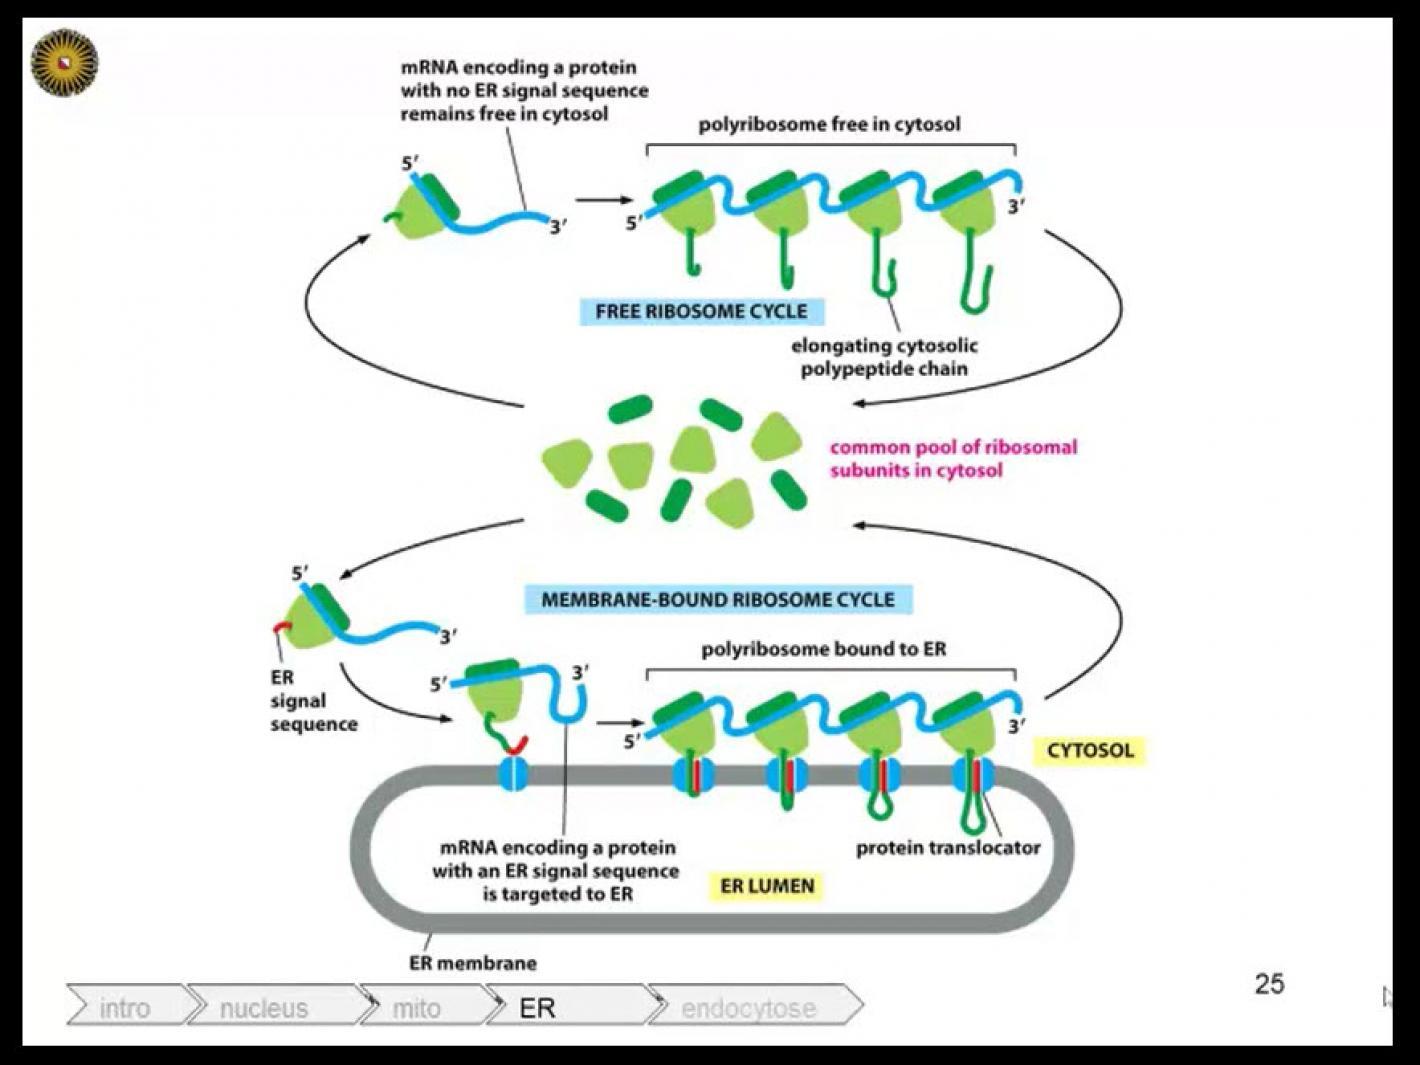 Celbiologie